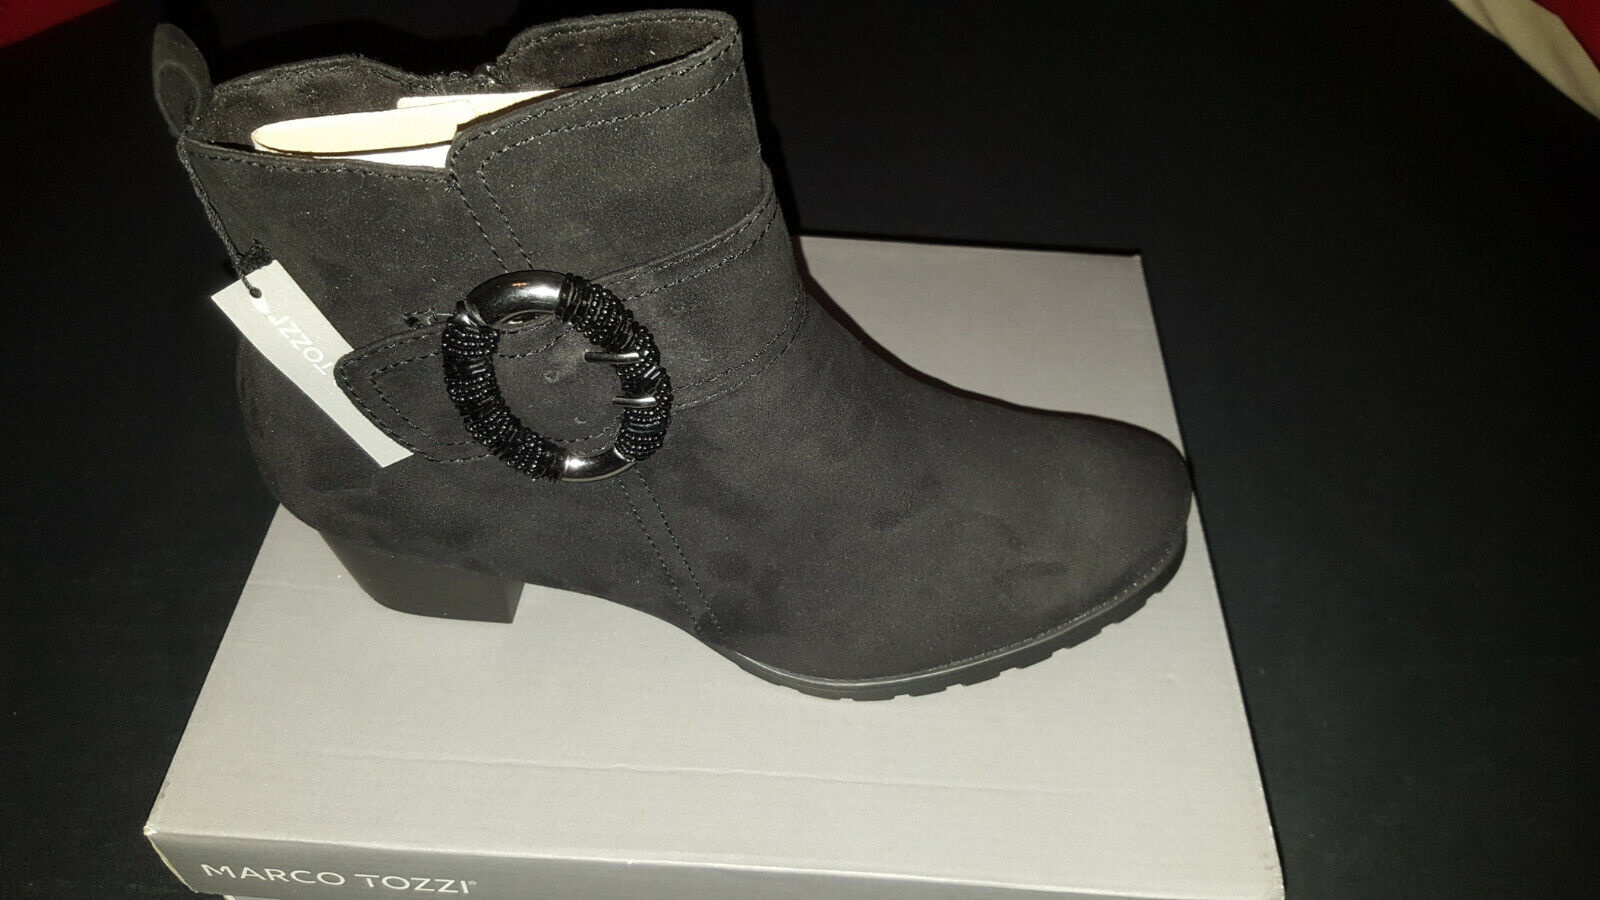 Marco Tozzi Damen Stiefelette Bikerstiefelette BikerStiefel Stiefel Schuhe schwarz